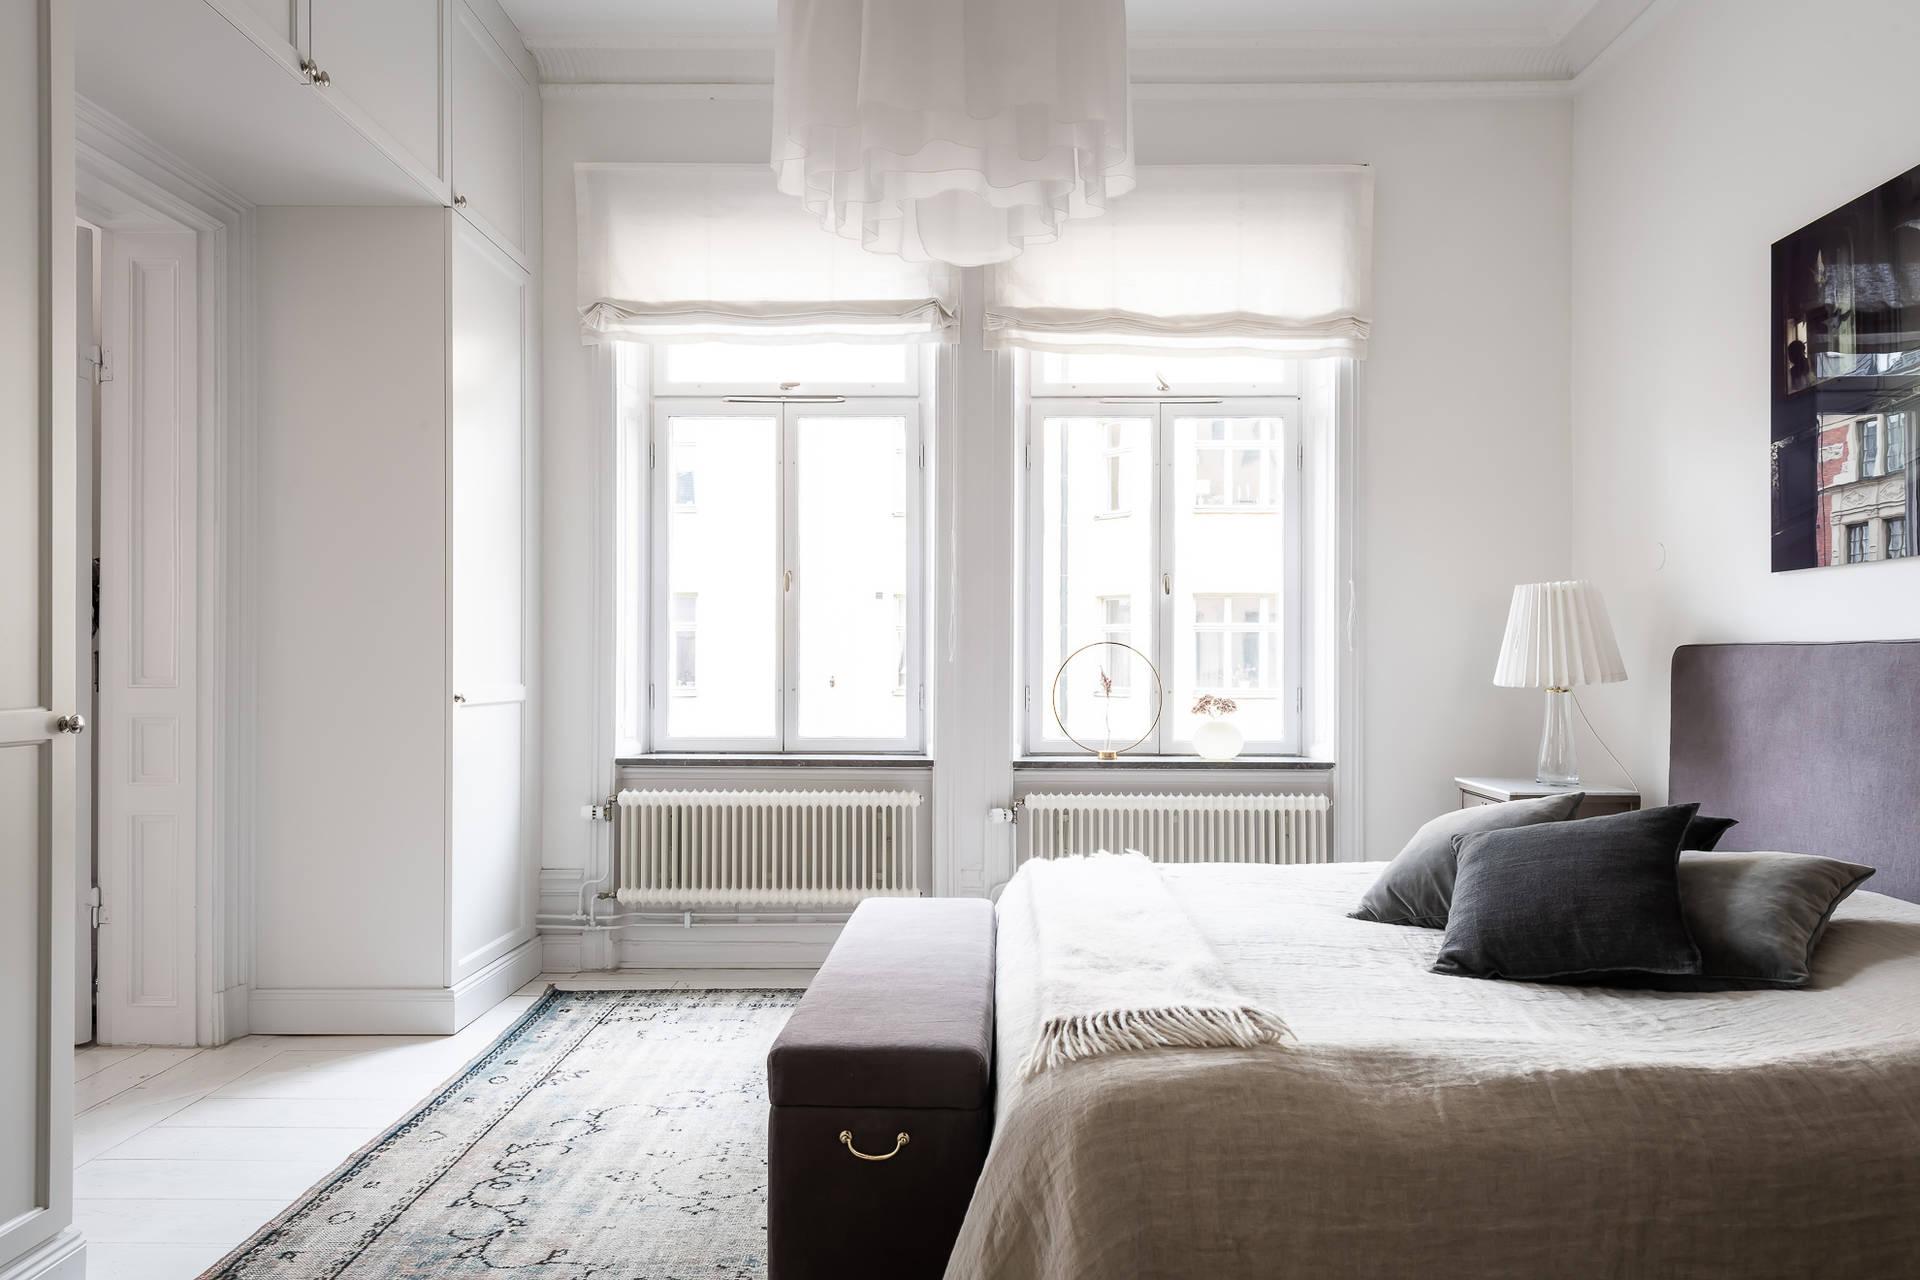 2 My Luxury Linen peace of home.jpg